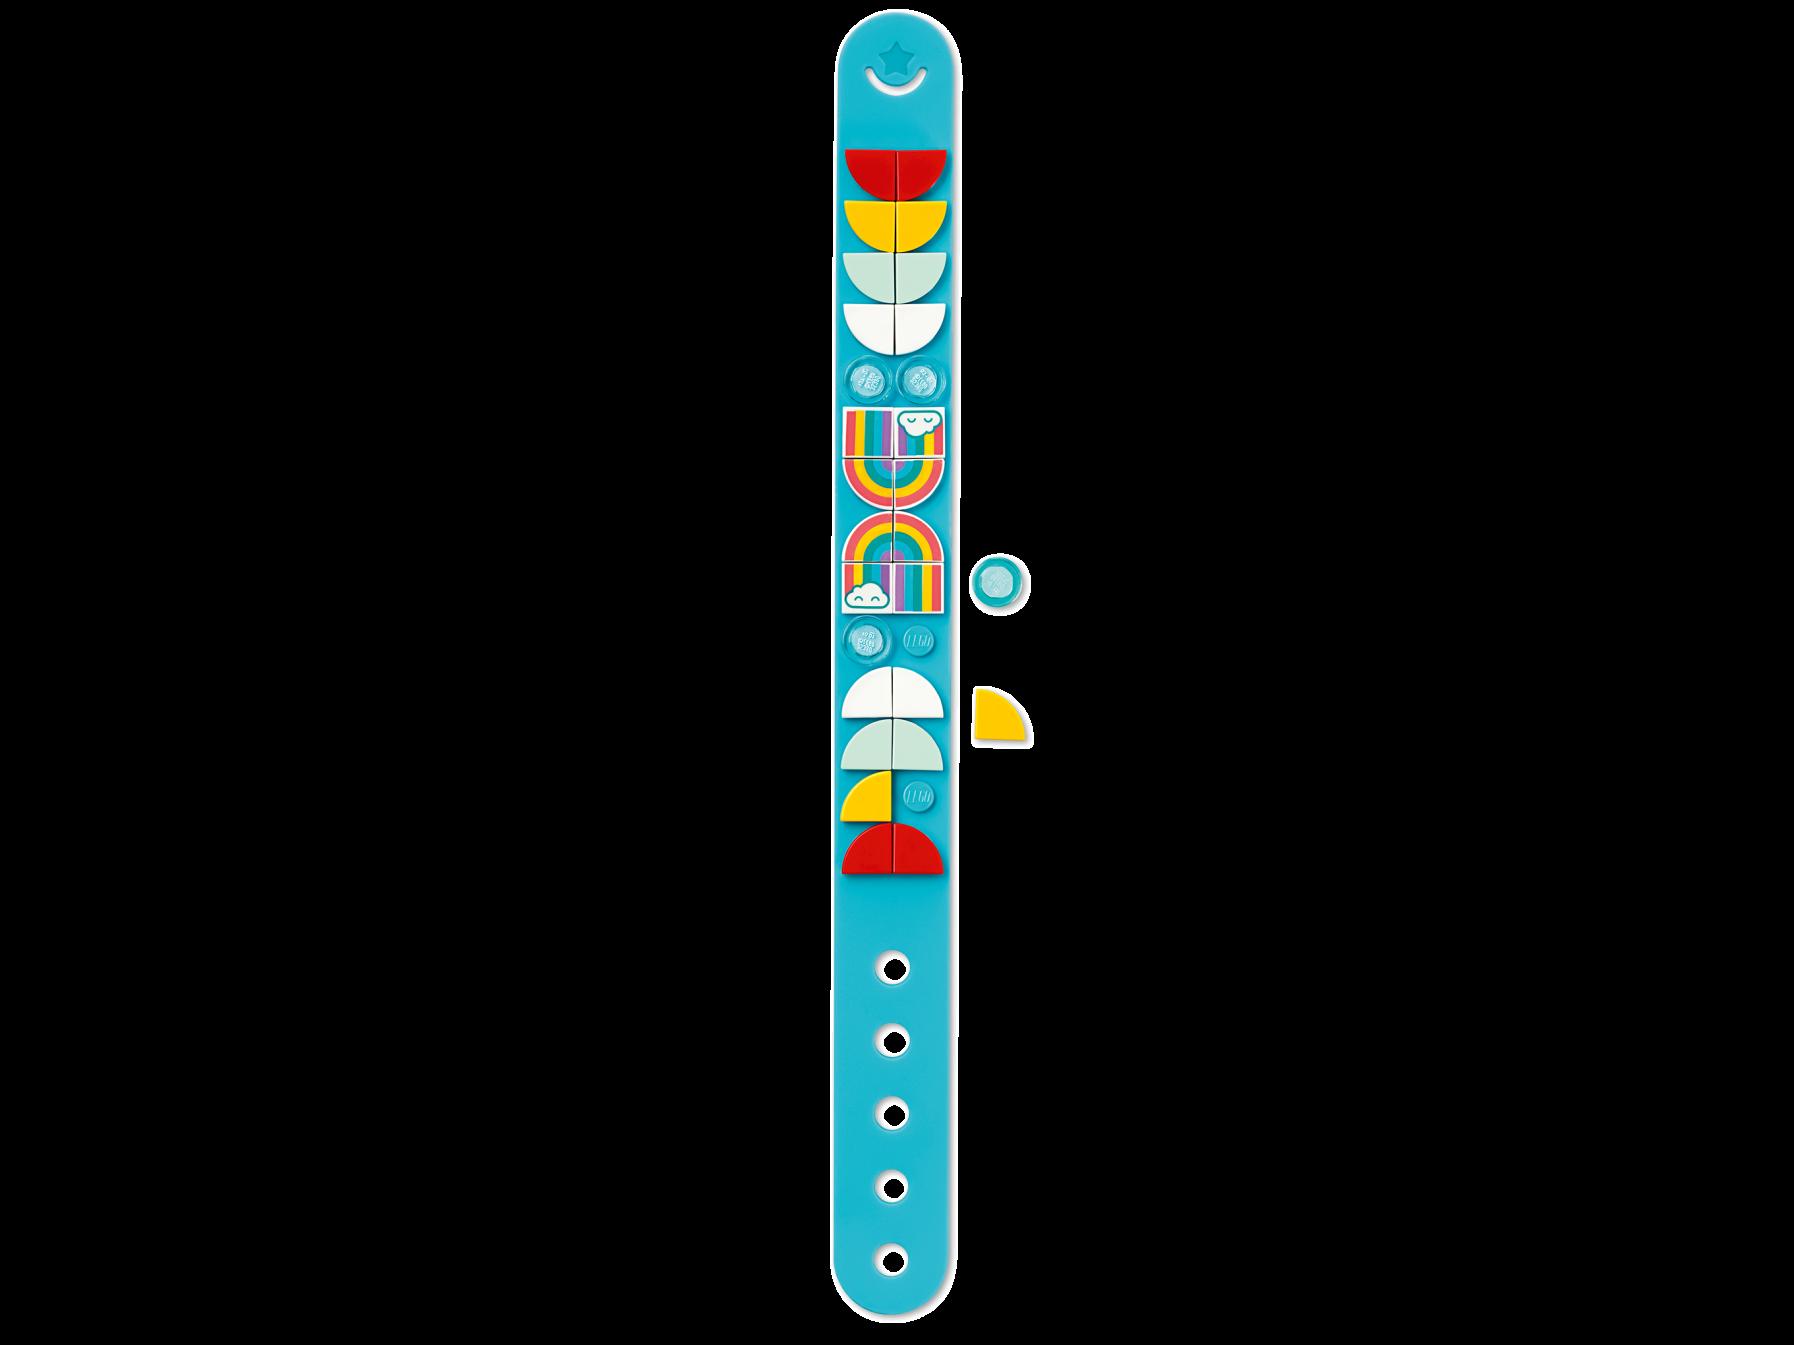 lego regenboog armband 41900